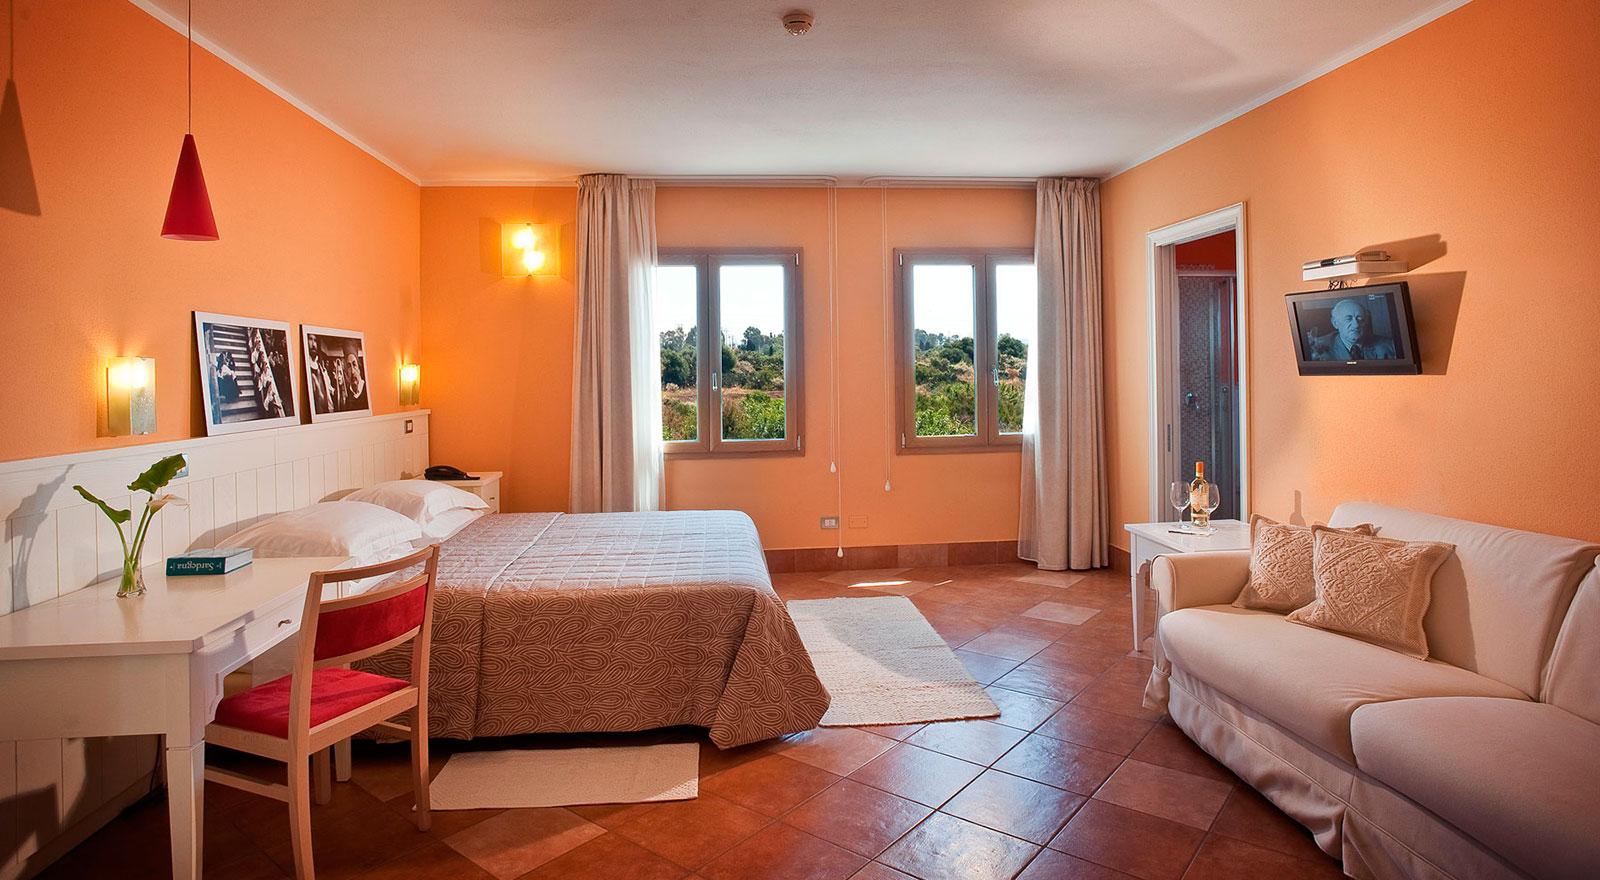 Hotel Marinii Pula 3 Star Hotel Sardinia Accommodation In Cagliari Marin